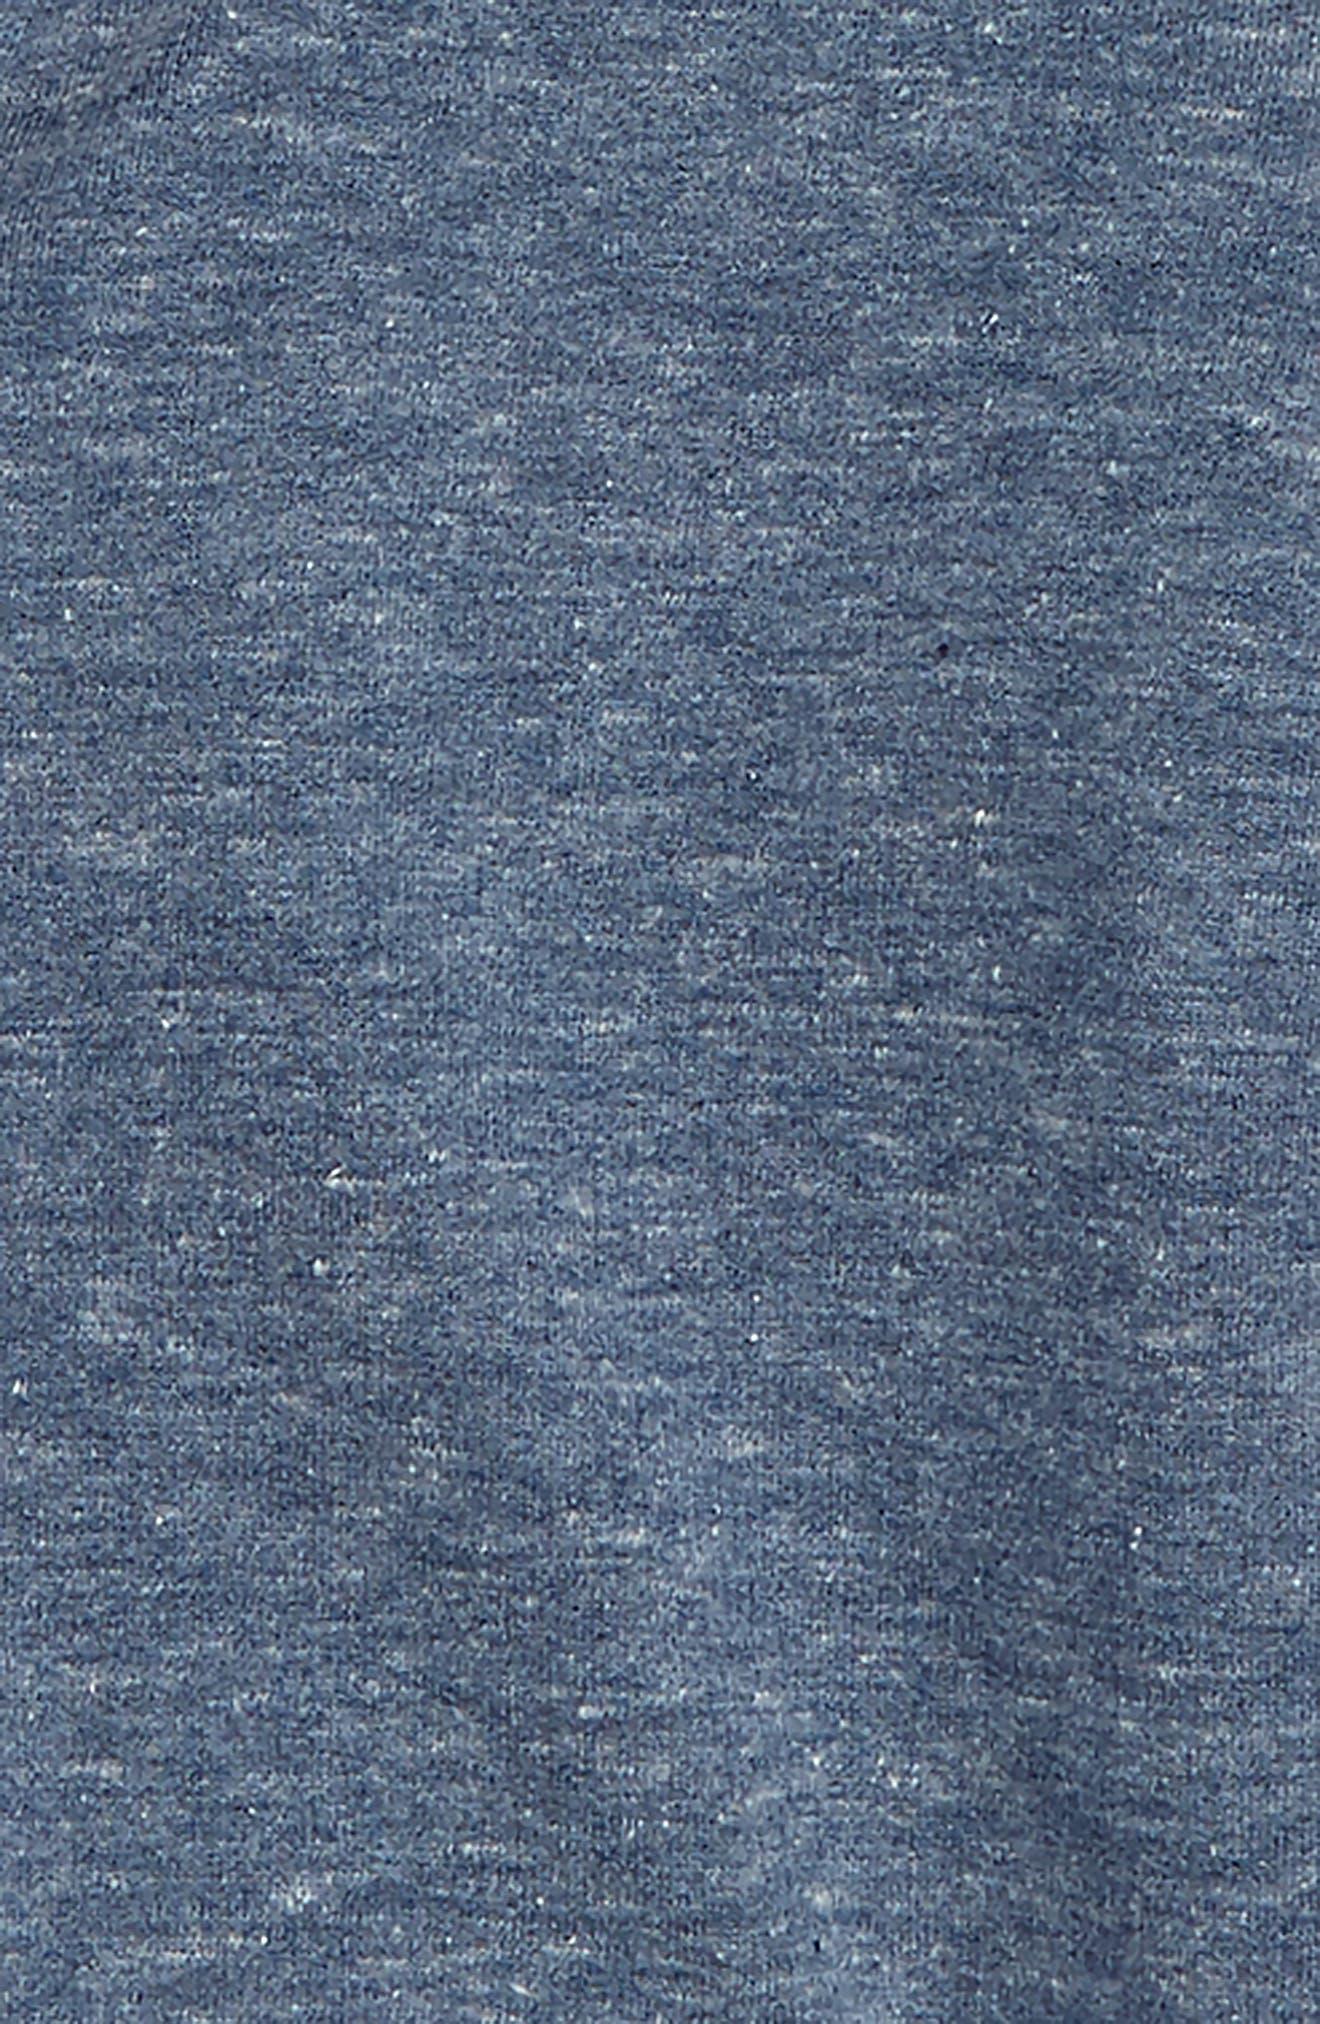 Colorblock Zip Crew Sweatshirt,                             Alternate thumbnail 2, color,                             401